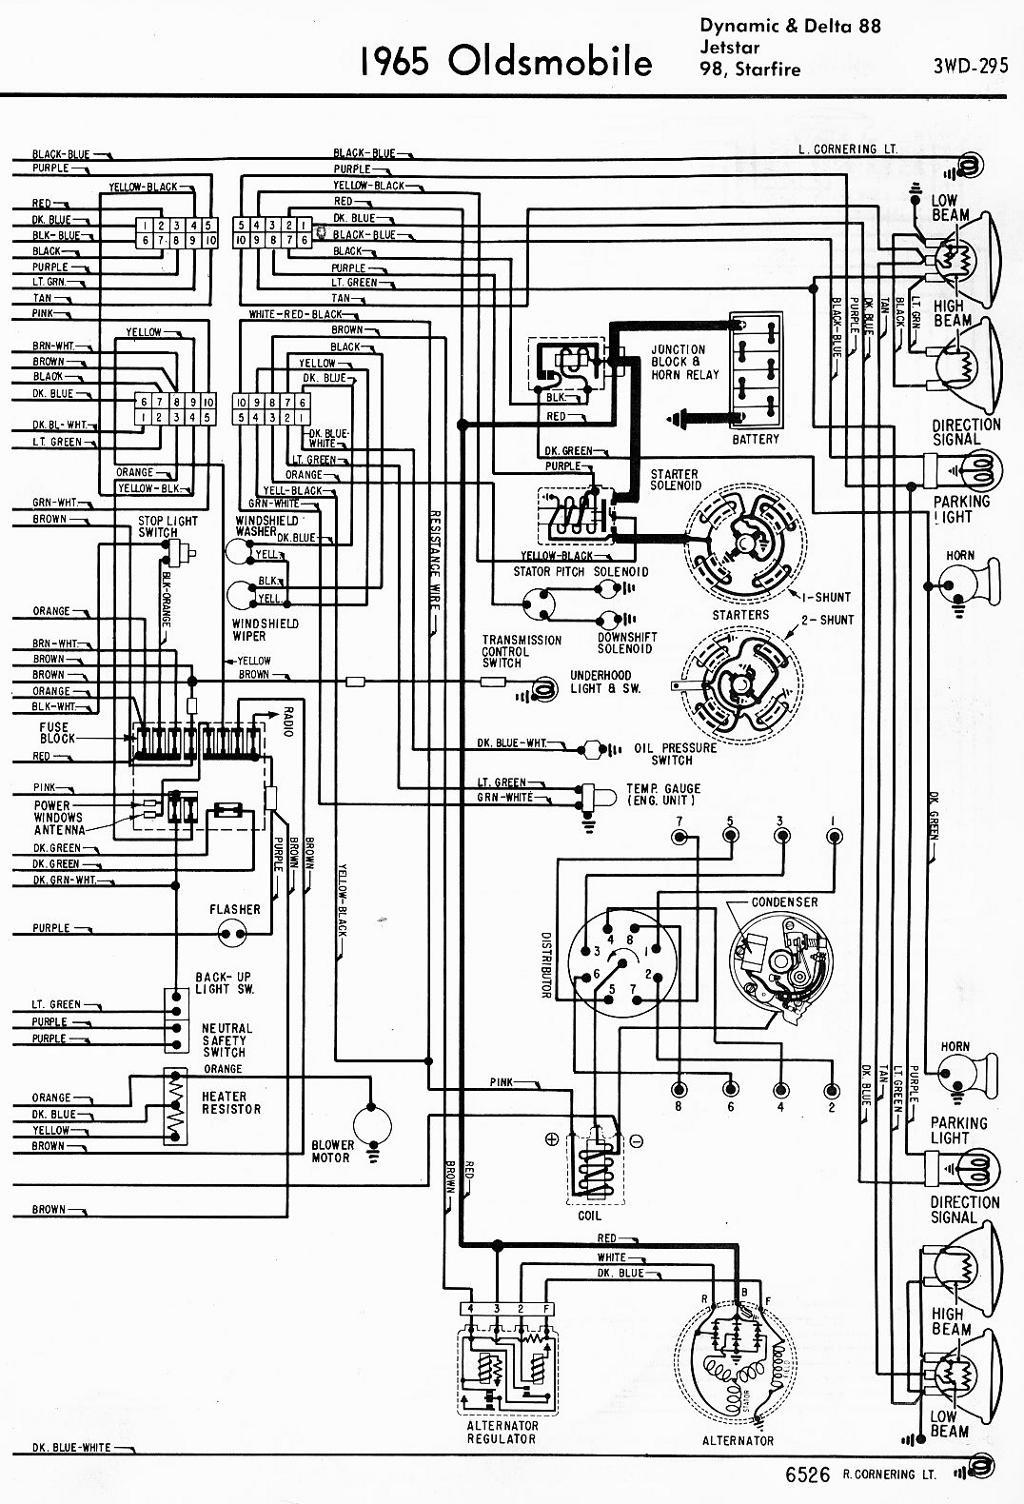 small resolution of 1992 oldsmobile 88 wiring diagram wiring diagram third level rh 10 8 19 jacobwinterstein com 1999 taurus wiring diagram 1999 buick century wiring diagram